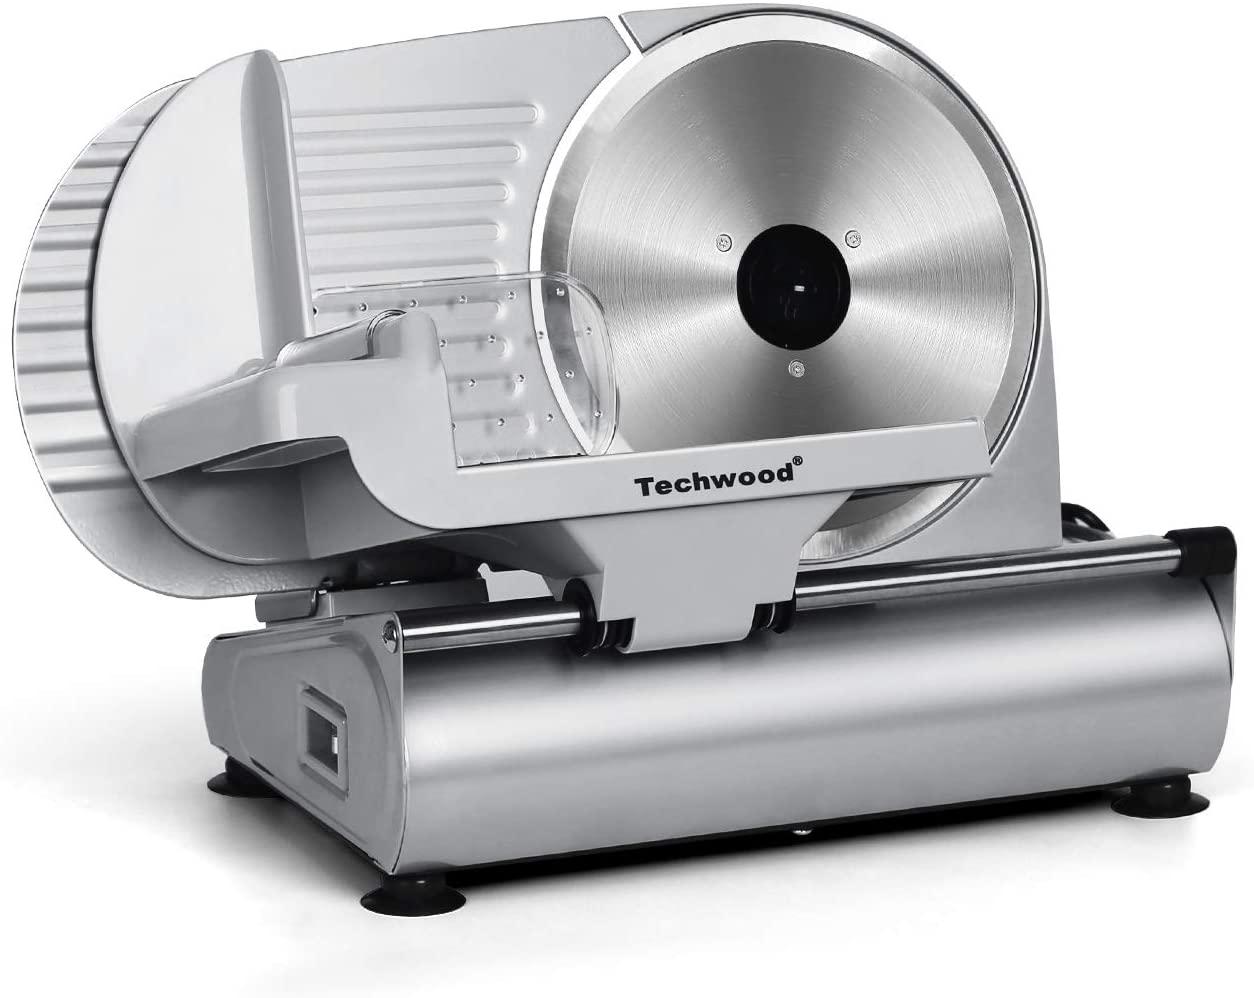 Techwood 9-Inch Deli Food Slicer